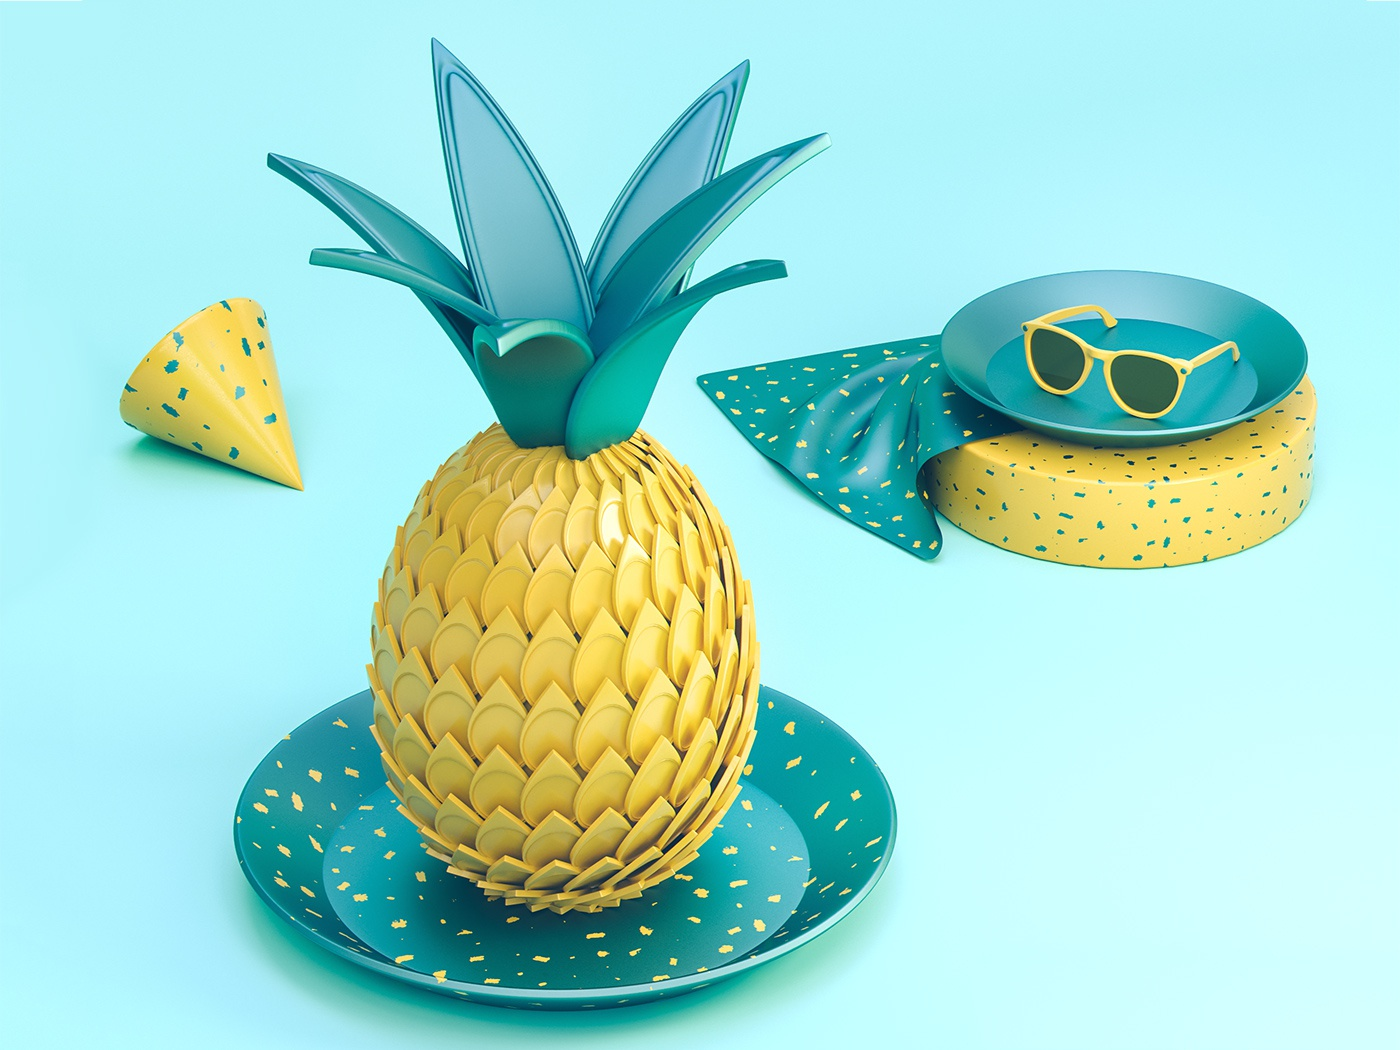 Summer Vibes #1 still still life fruit pineapple yellow sunglasses abstract low poly octane illustration design cinema 4d 3d summer